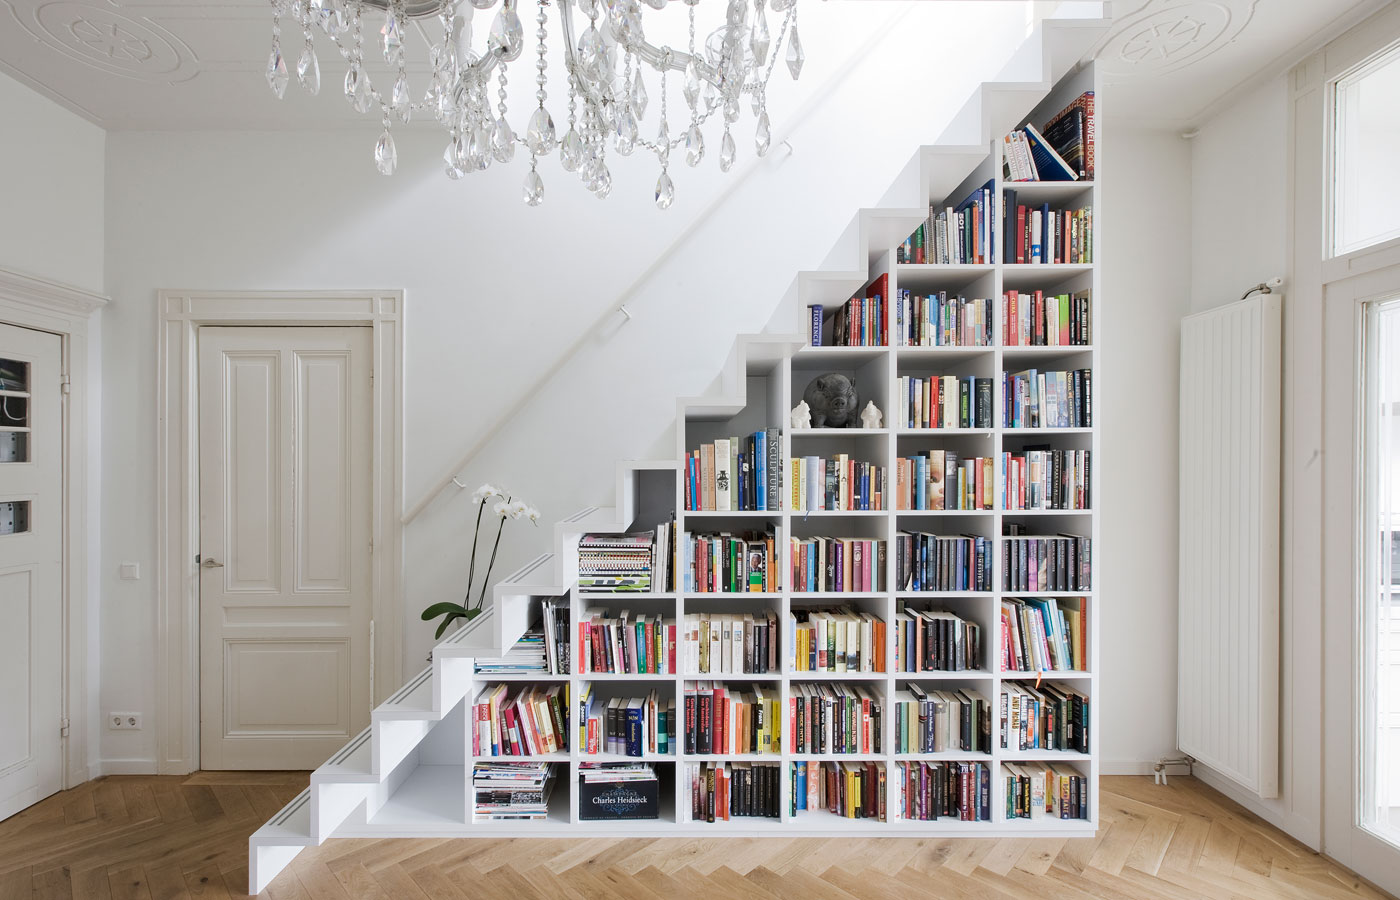 Distinctive Staircase Book Storage Hack Storage Small Apartment Small Apartments Ideas apartment Ideas For Storage In Small Apartments